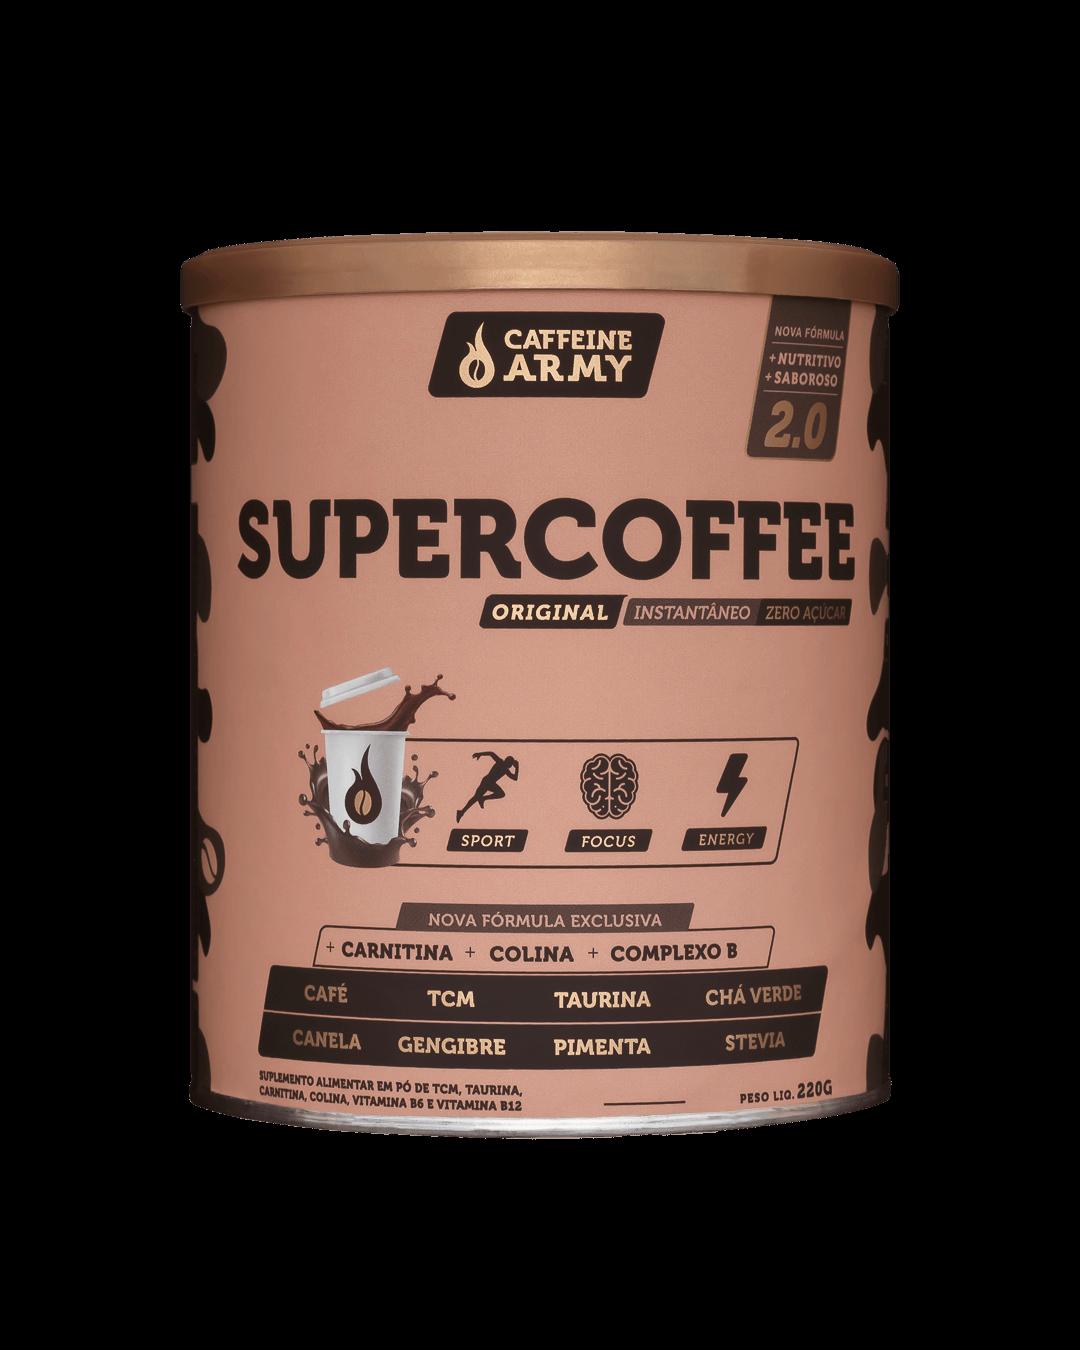 SUPERCOFFEE| 220G| CAFEINE ARMY